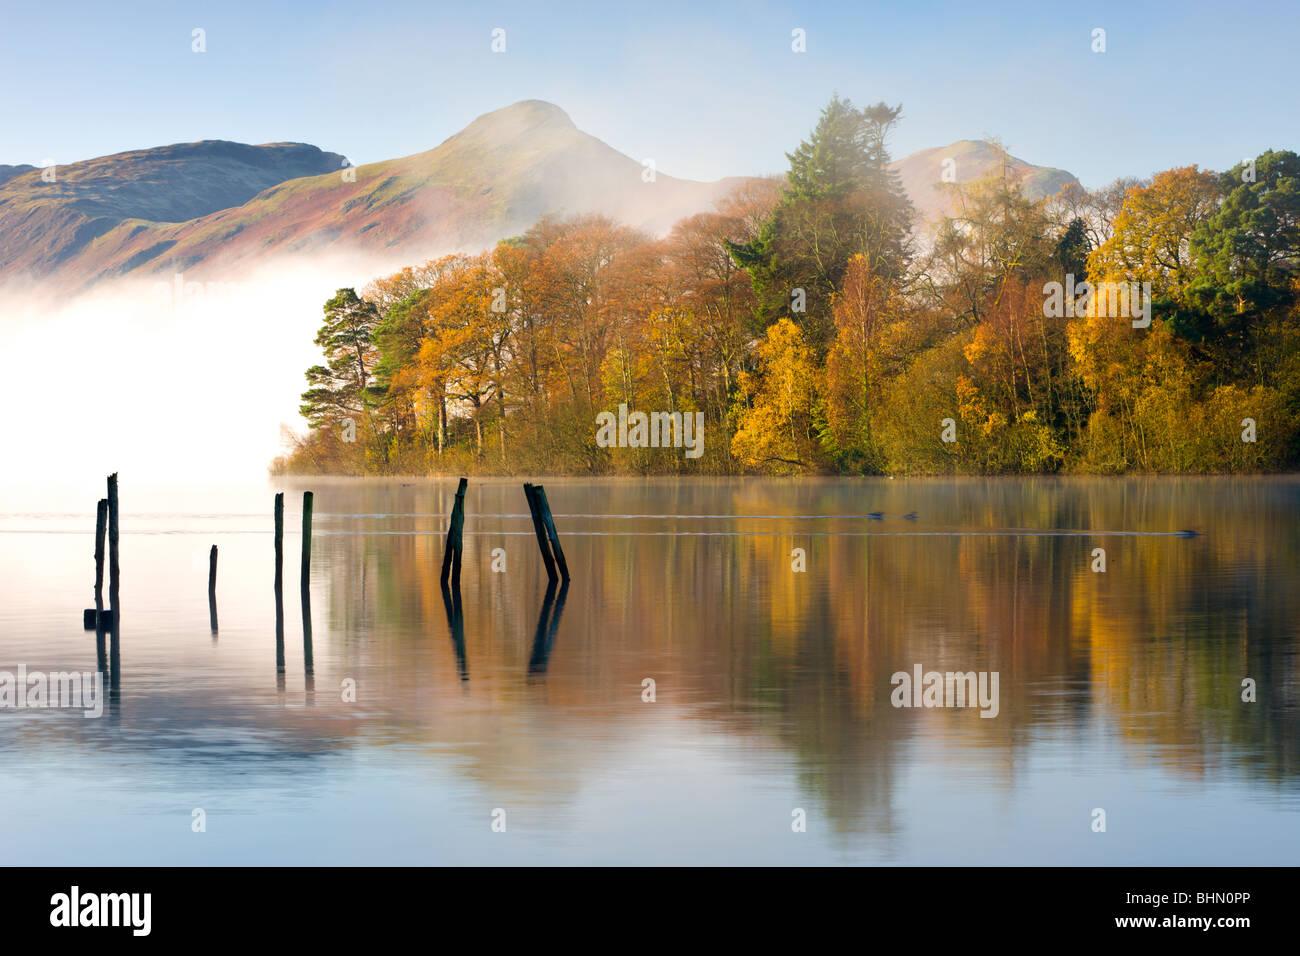 Autumn foliage on the banks of Derwent Water, Keswick, Lake District National Park, Cumbria, England, UK. Autumn - Stock Image